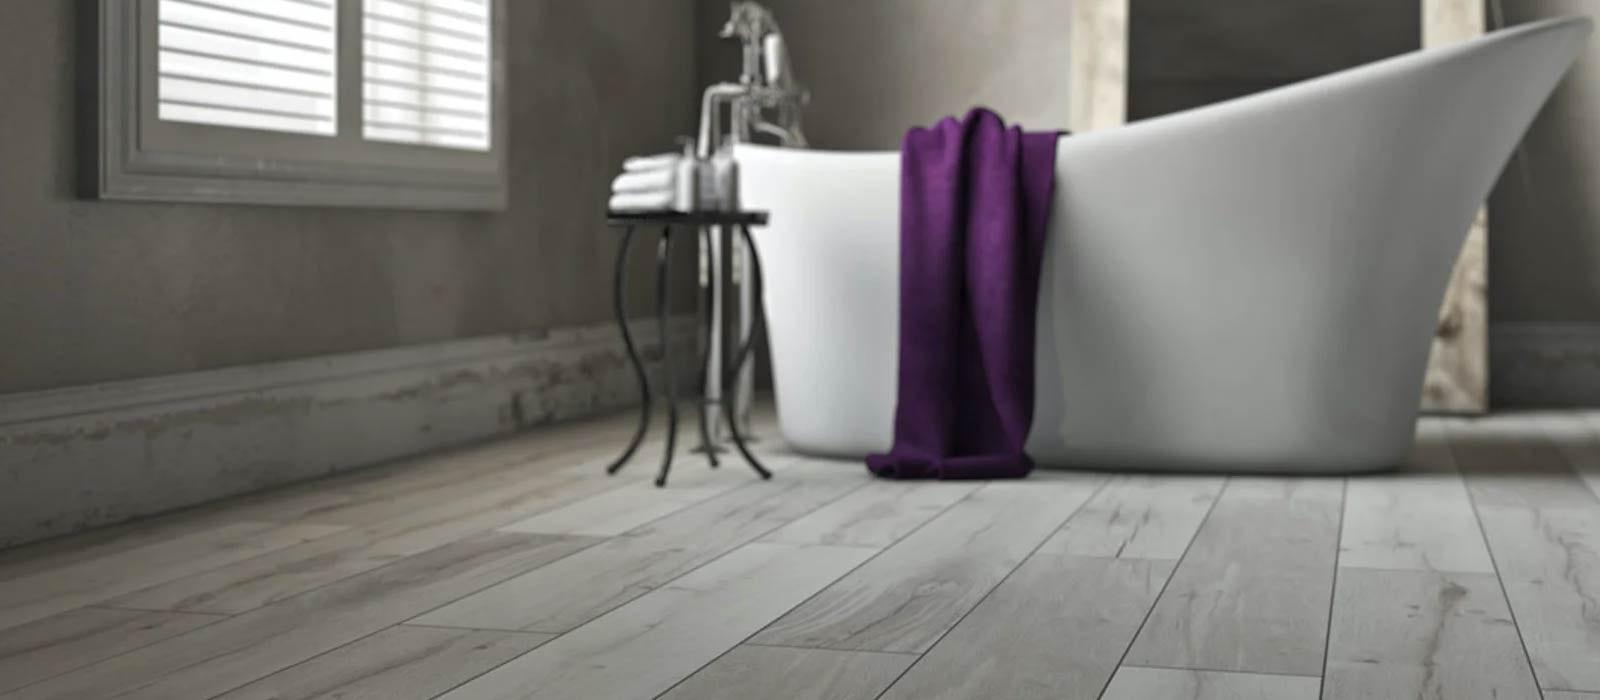 5 Great Bathroom Flooring Ideas For 2021 Beyond Victoriaplum Com